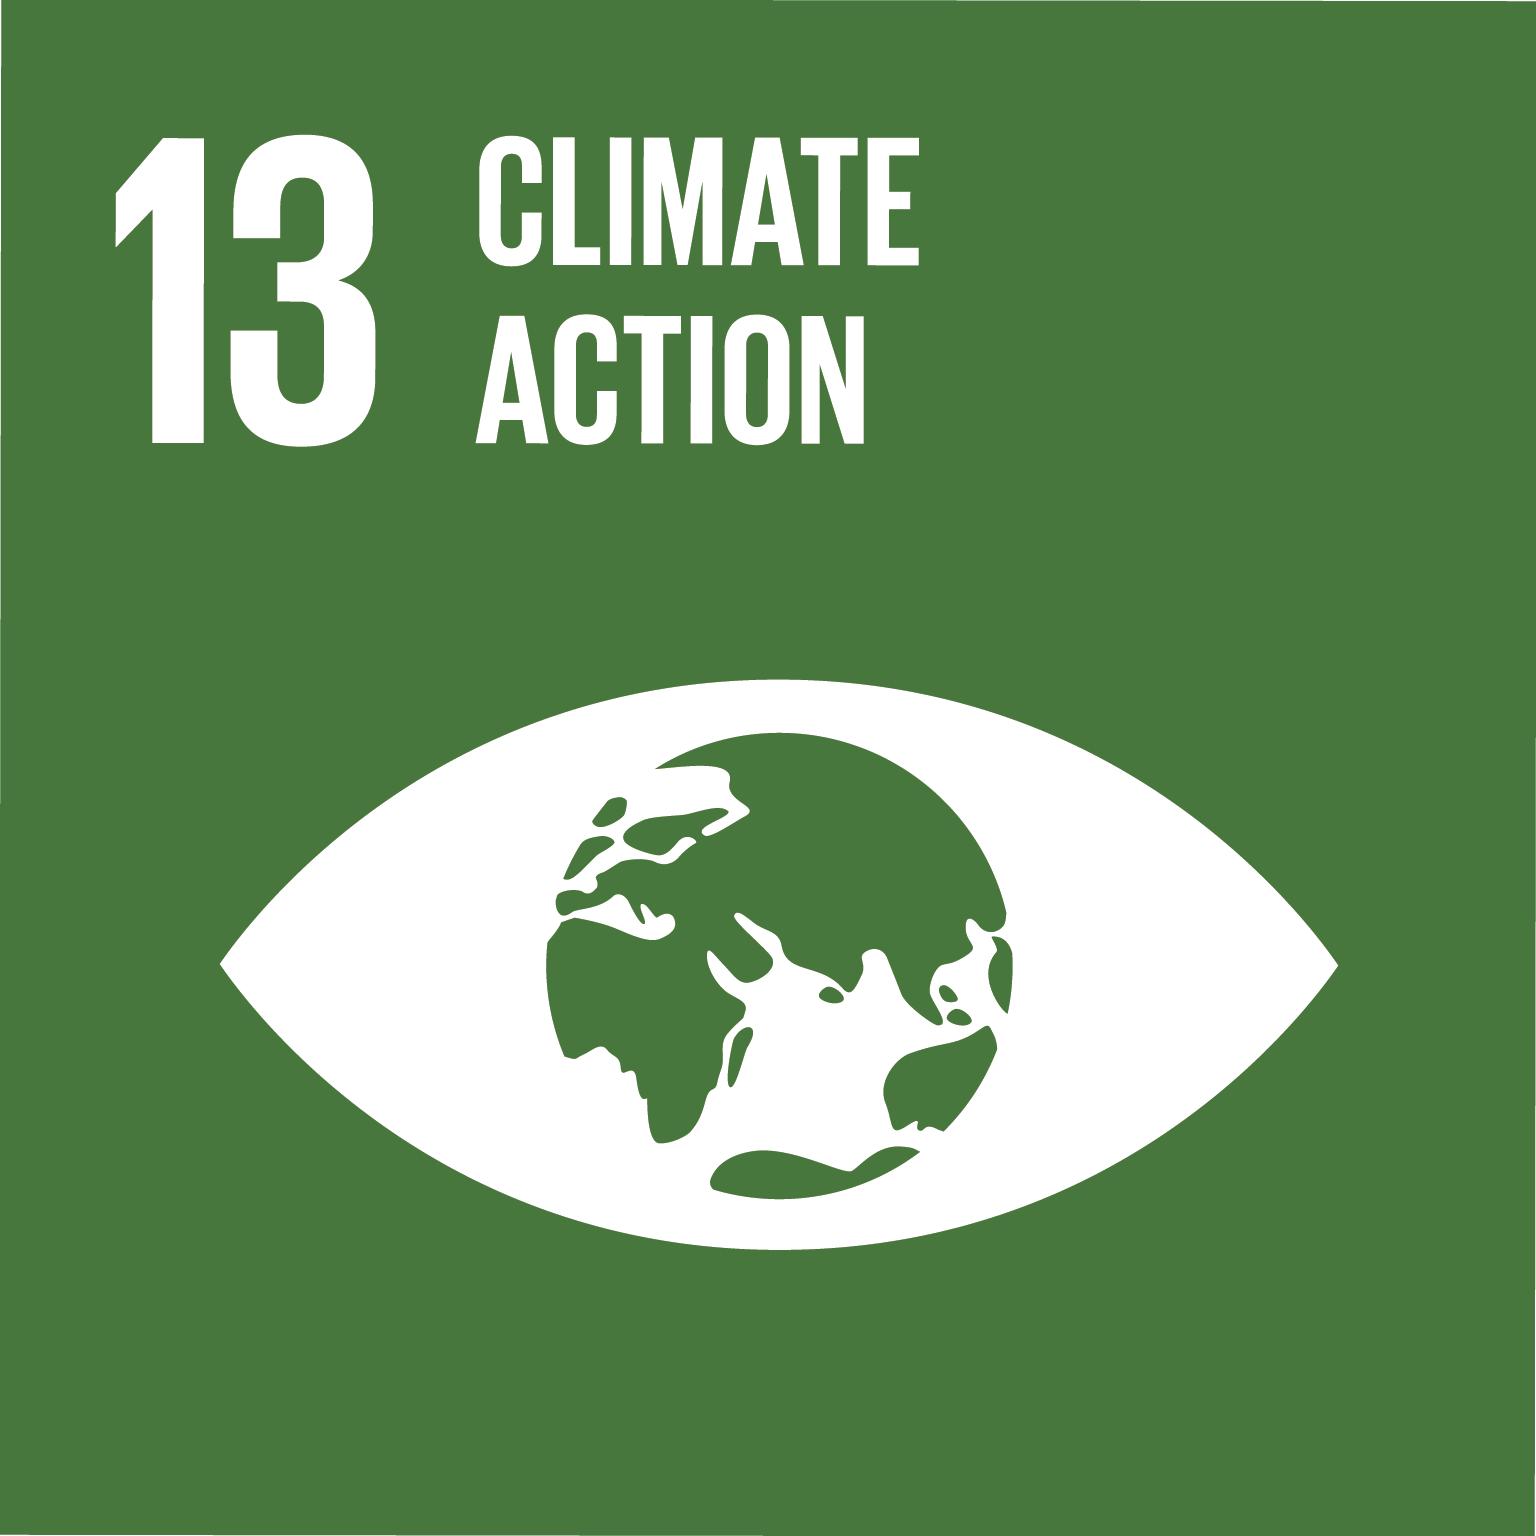 SDG Goal #13 Climate Action